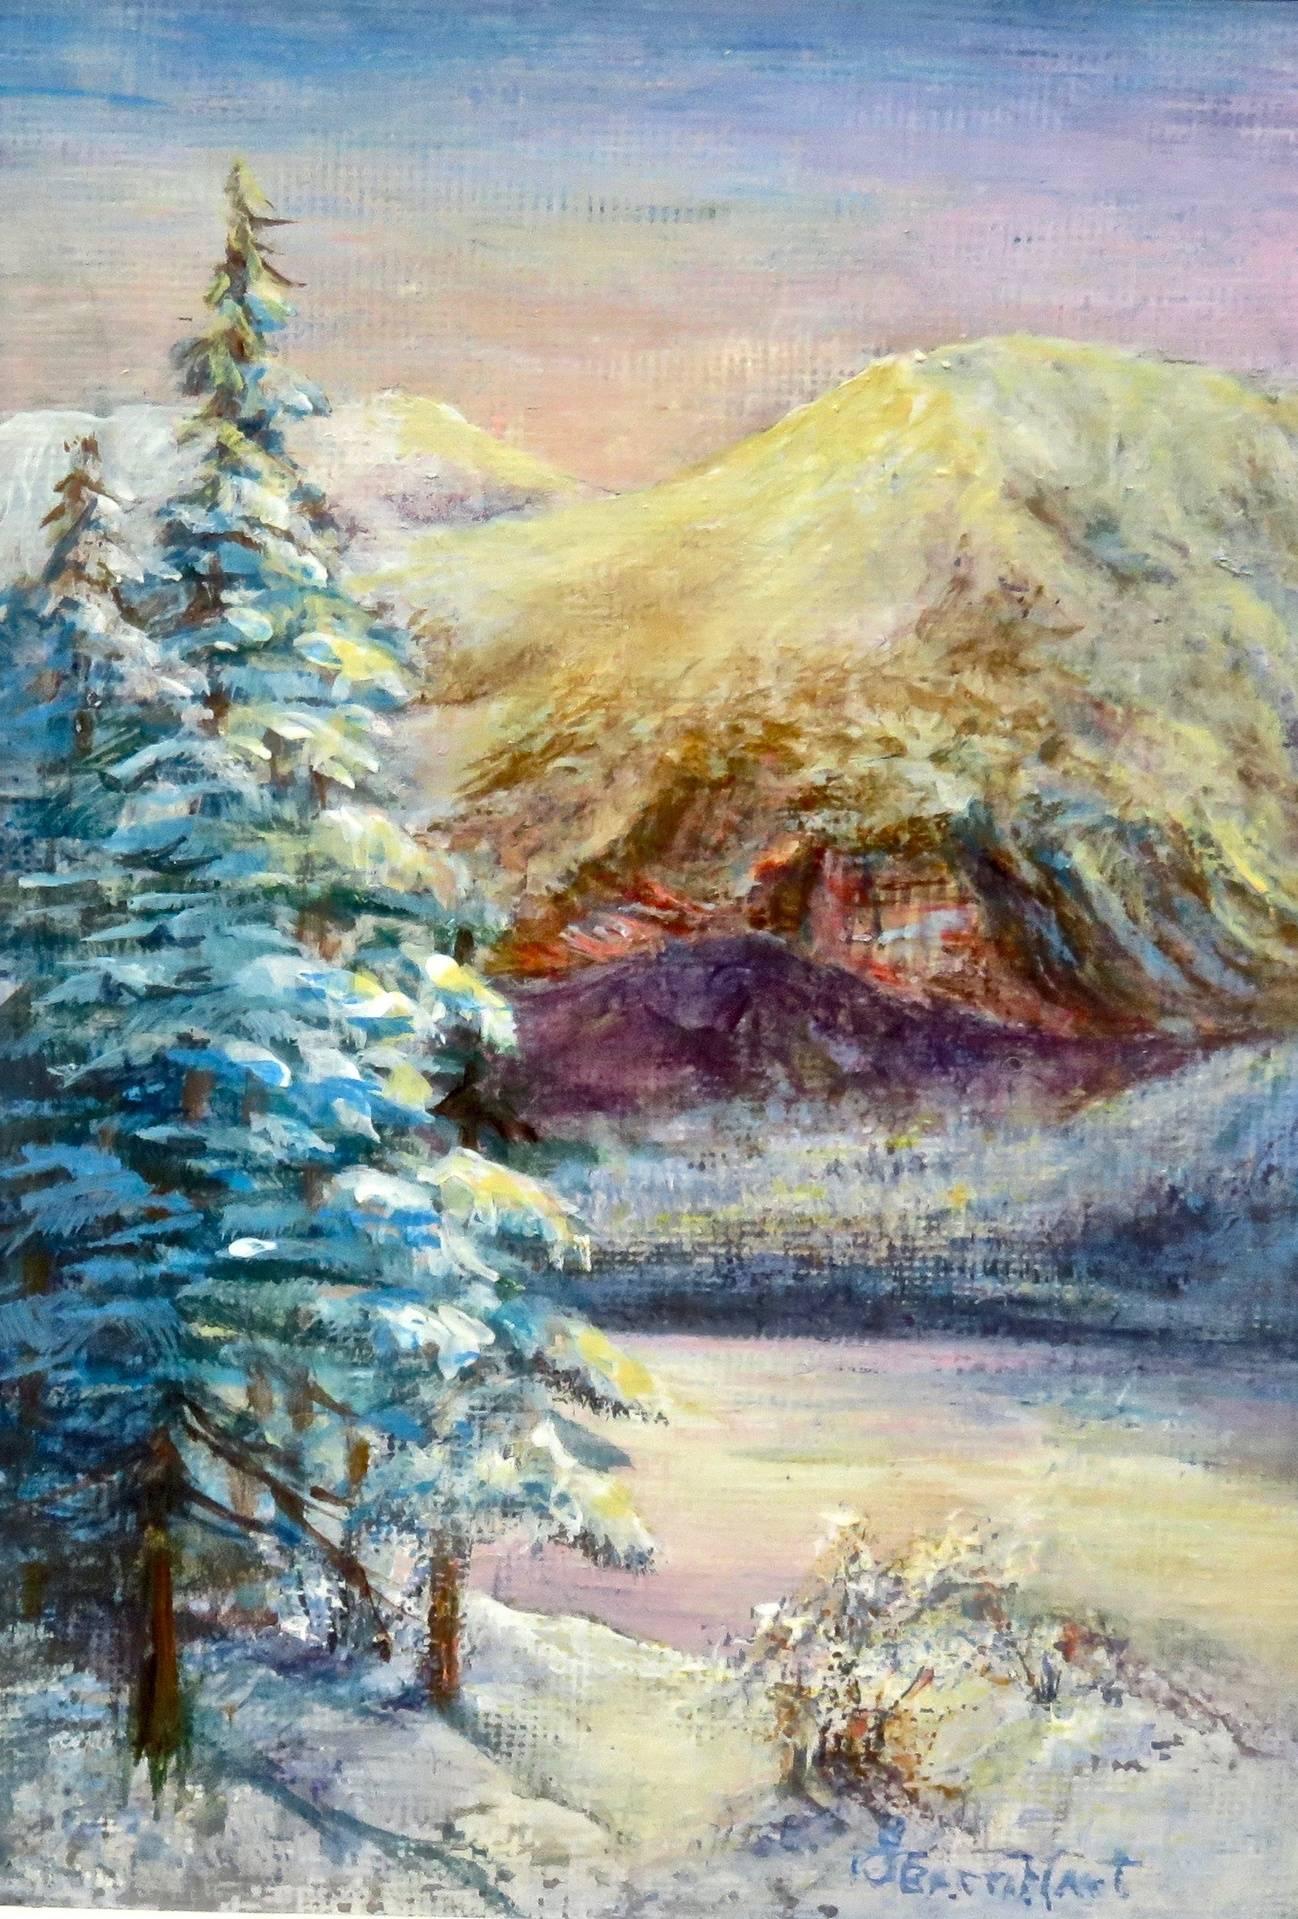 Awaken with Winter Light